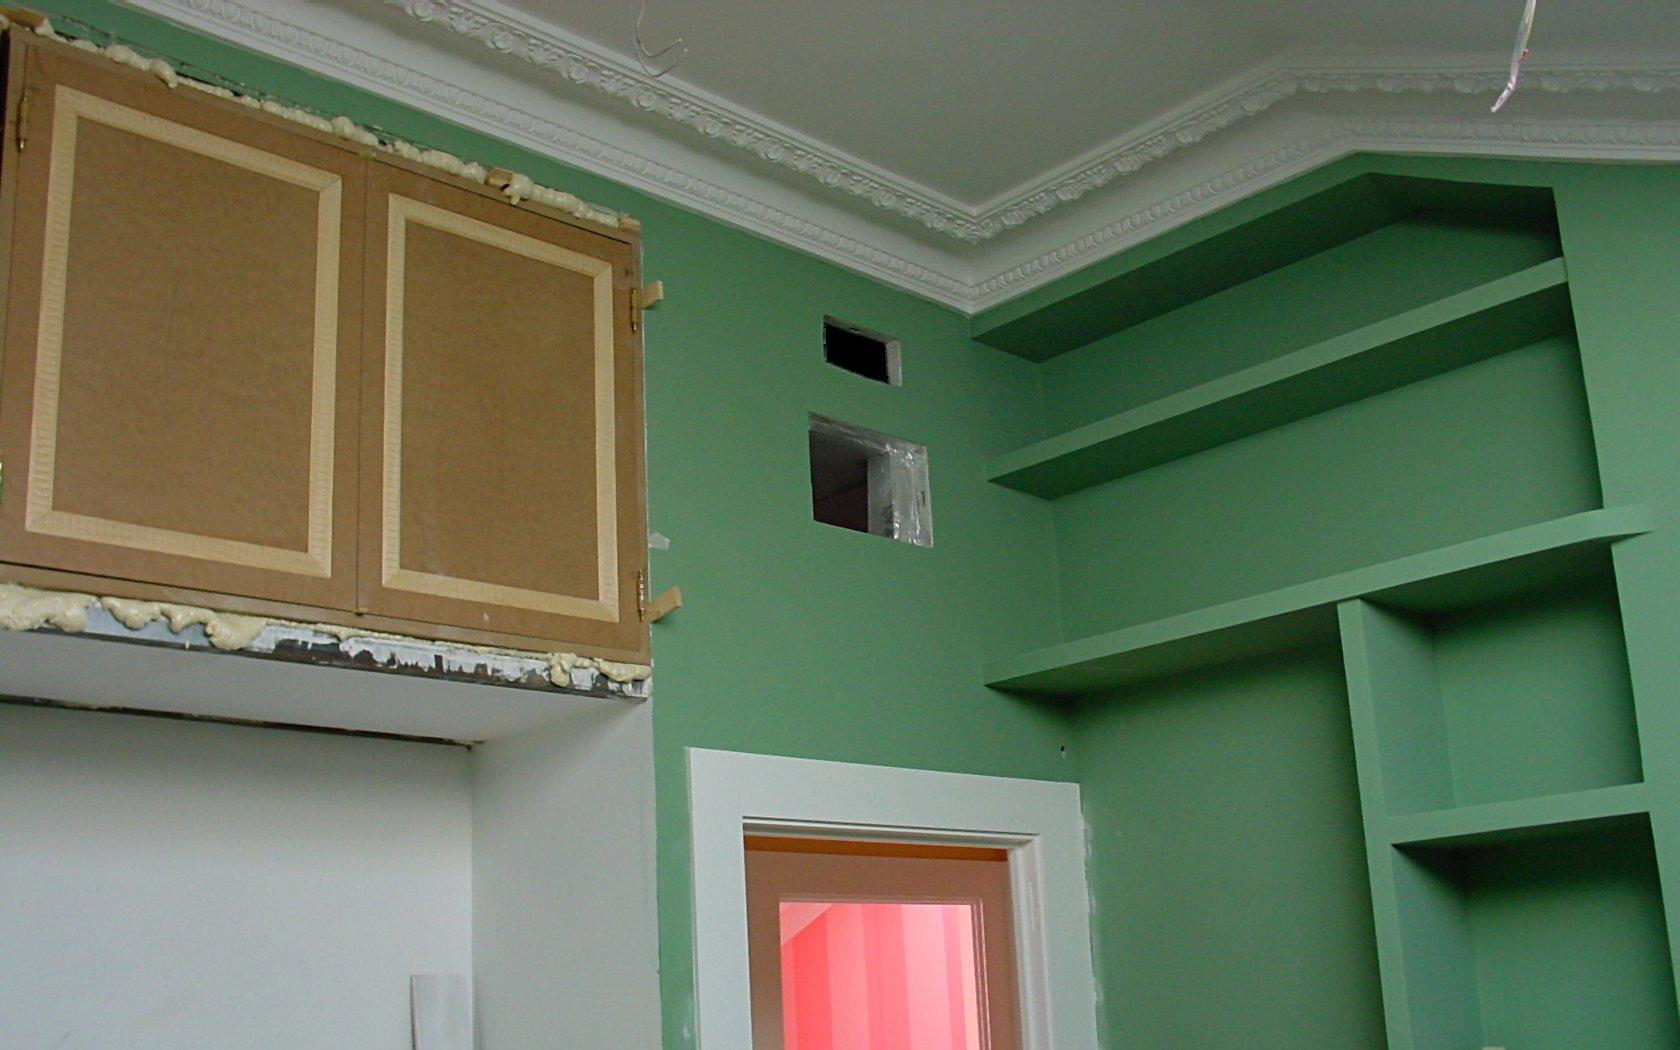 Pintura habitacion detalle esquina pictor decoris - Pintura para habitacion ...